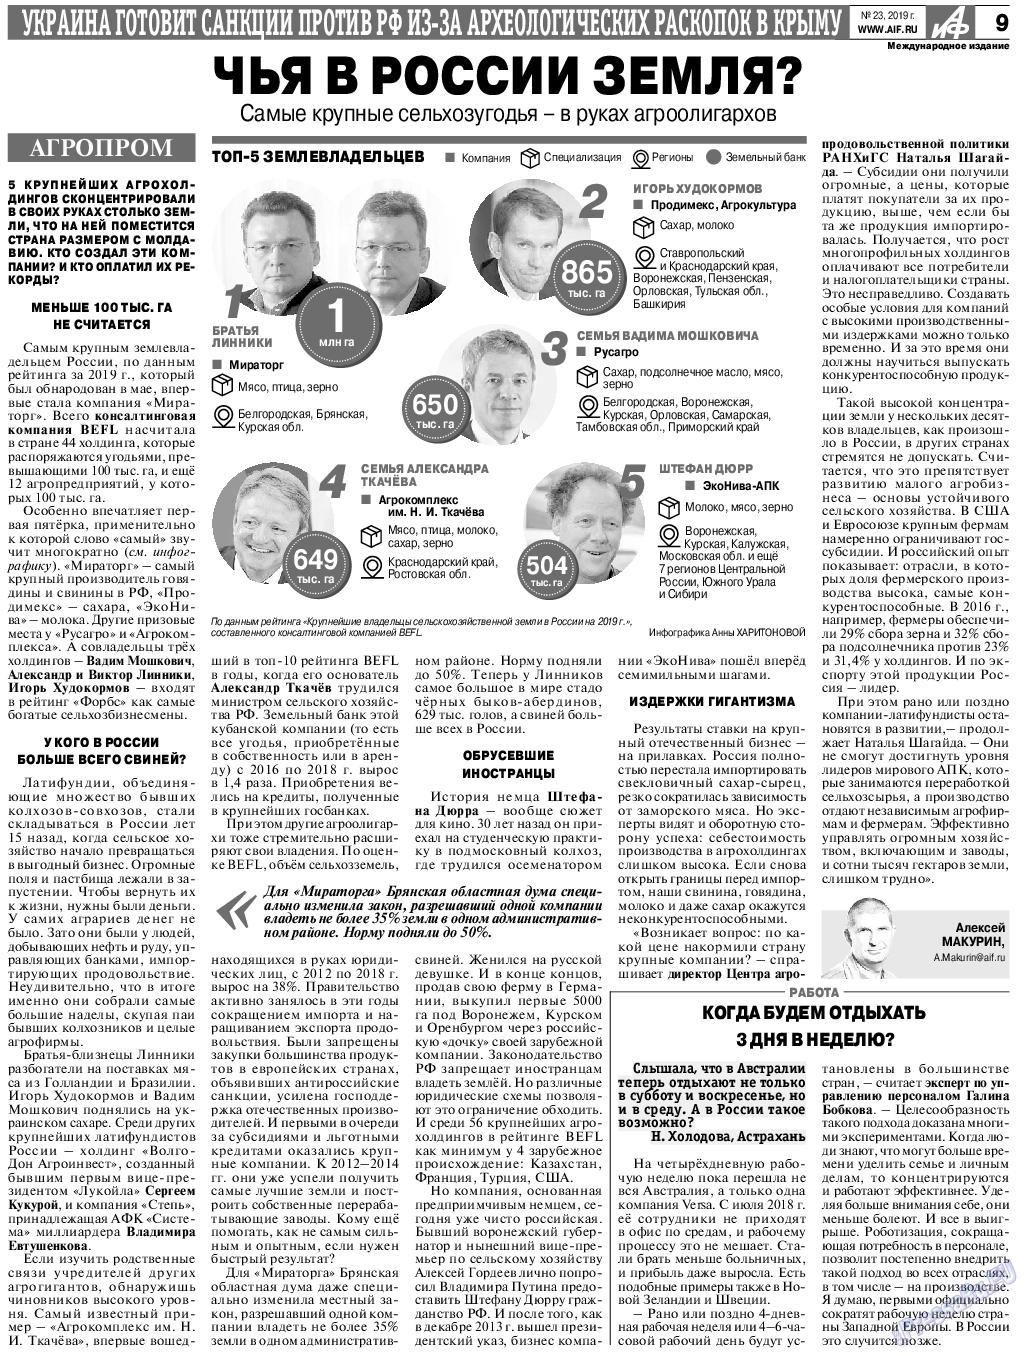 Аргументы и факты Европа (газета). 2019 год, номер 23, стр. 9